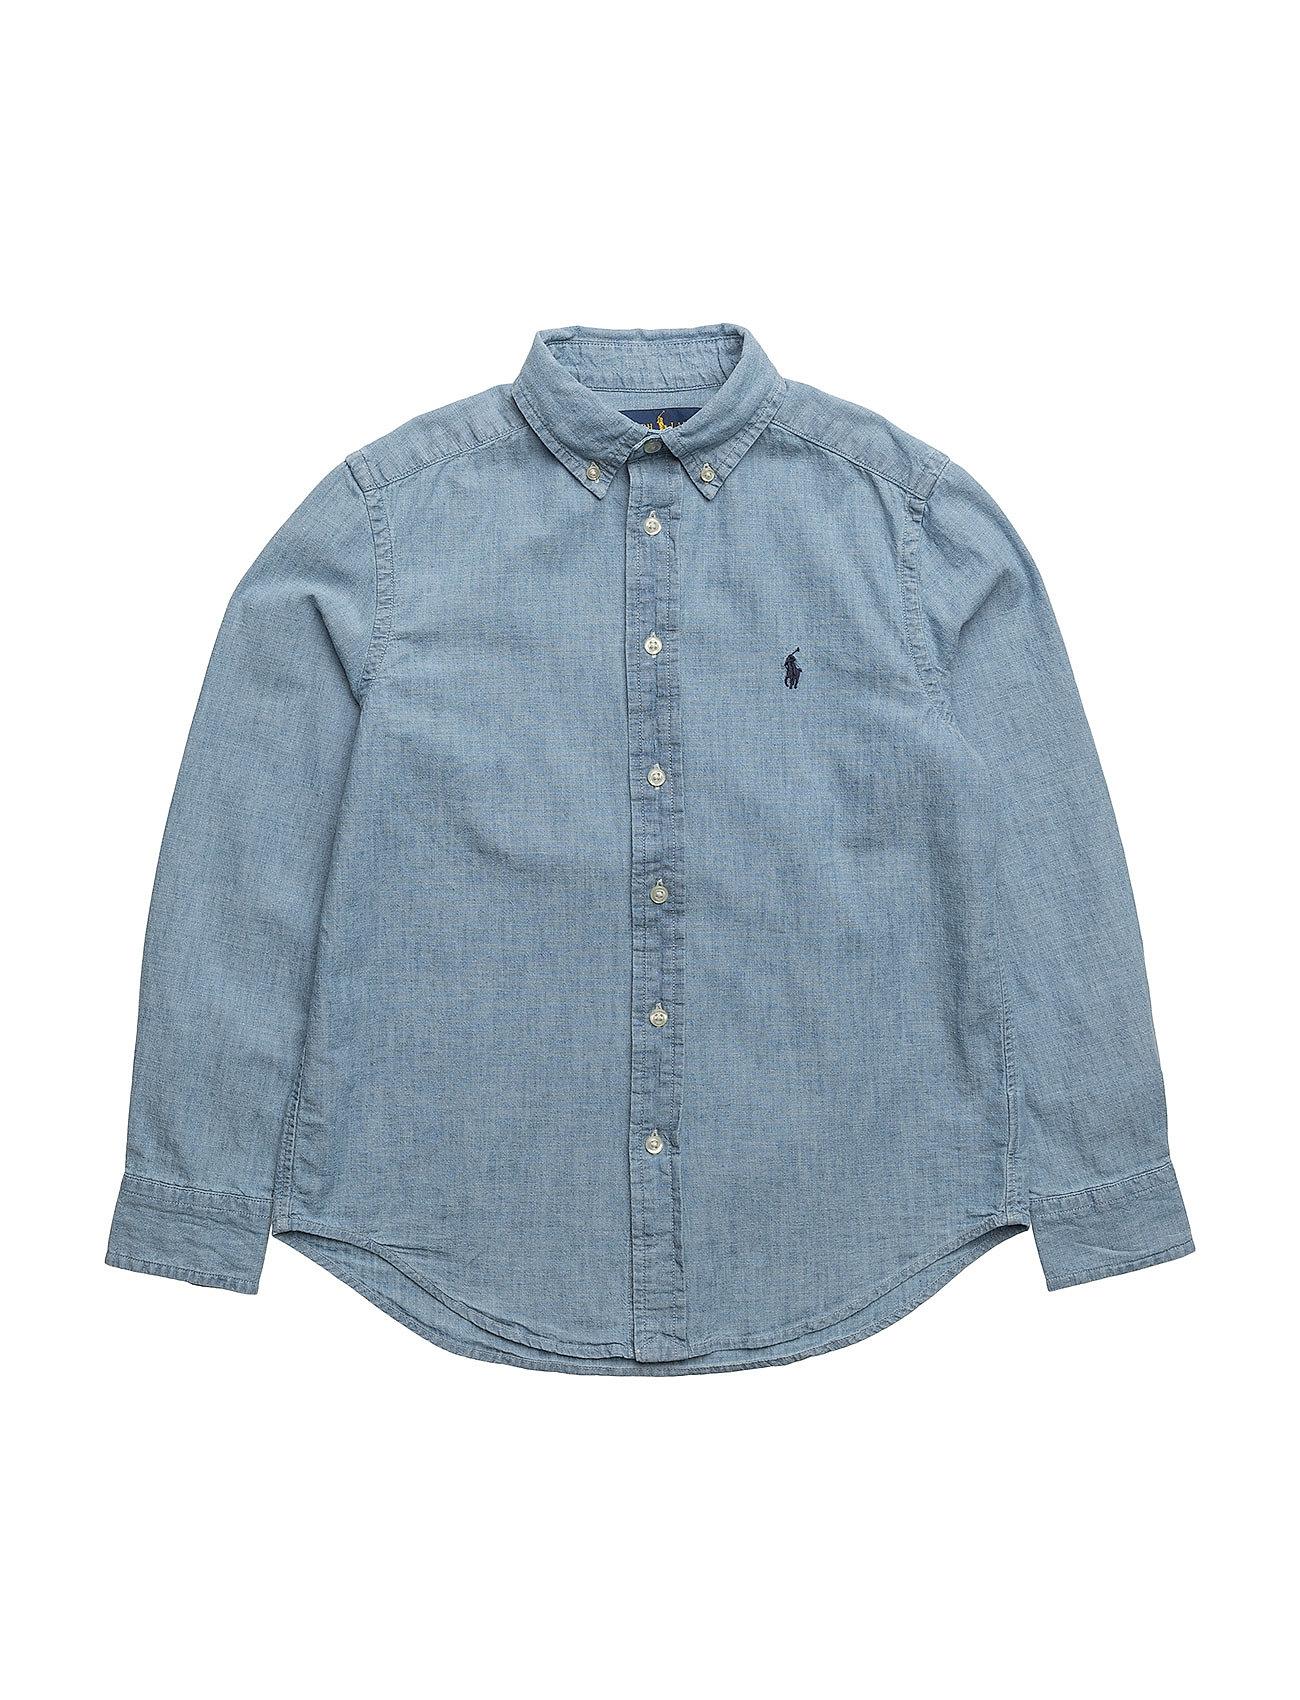 Chambray shirt light blue 699 kr ralph lauren kids for Chambray shirt for kids